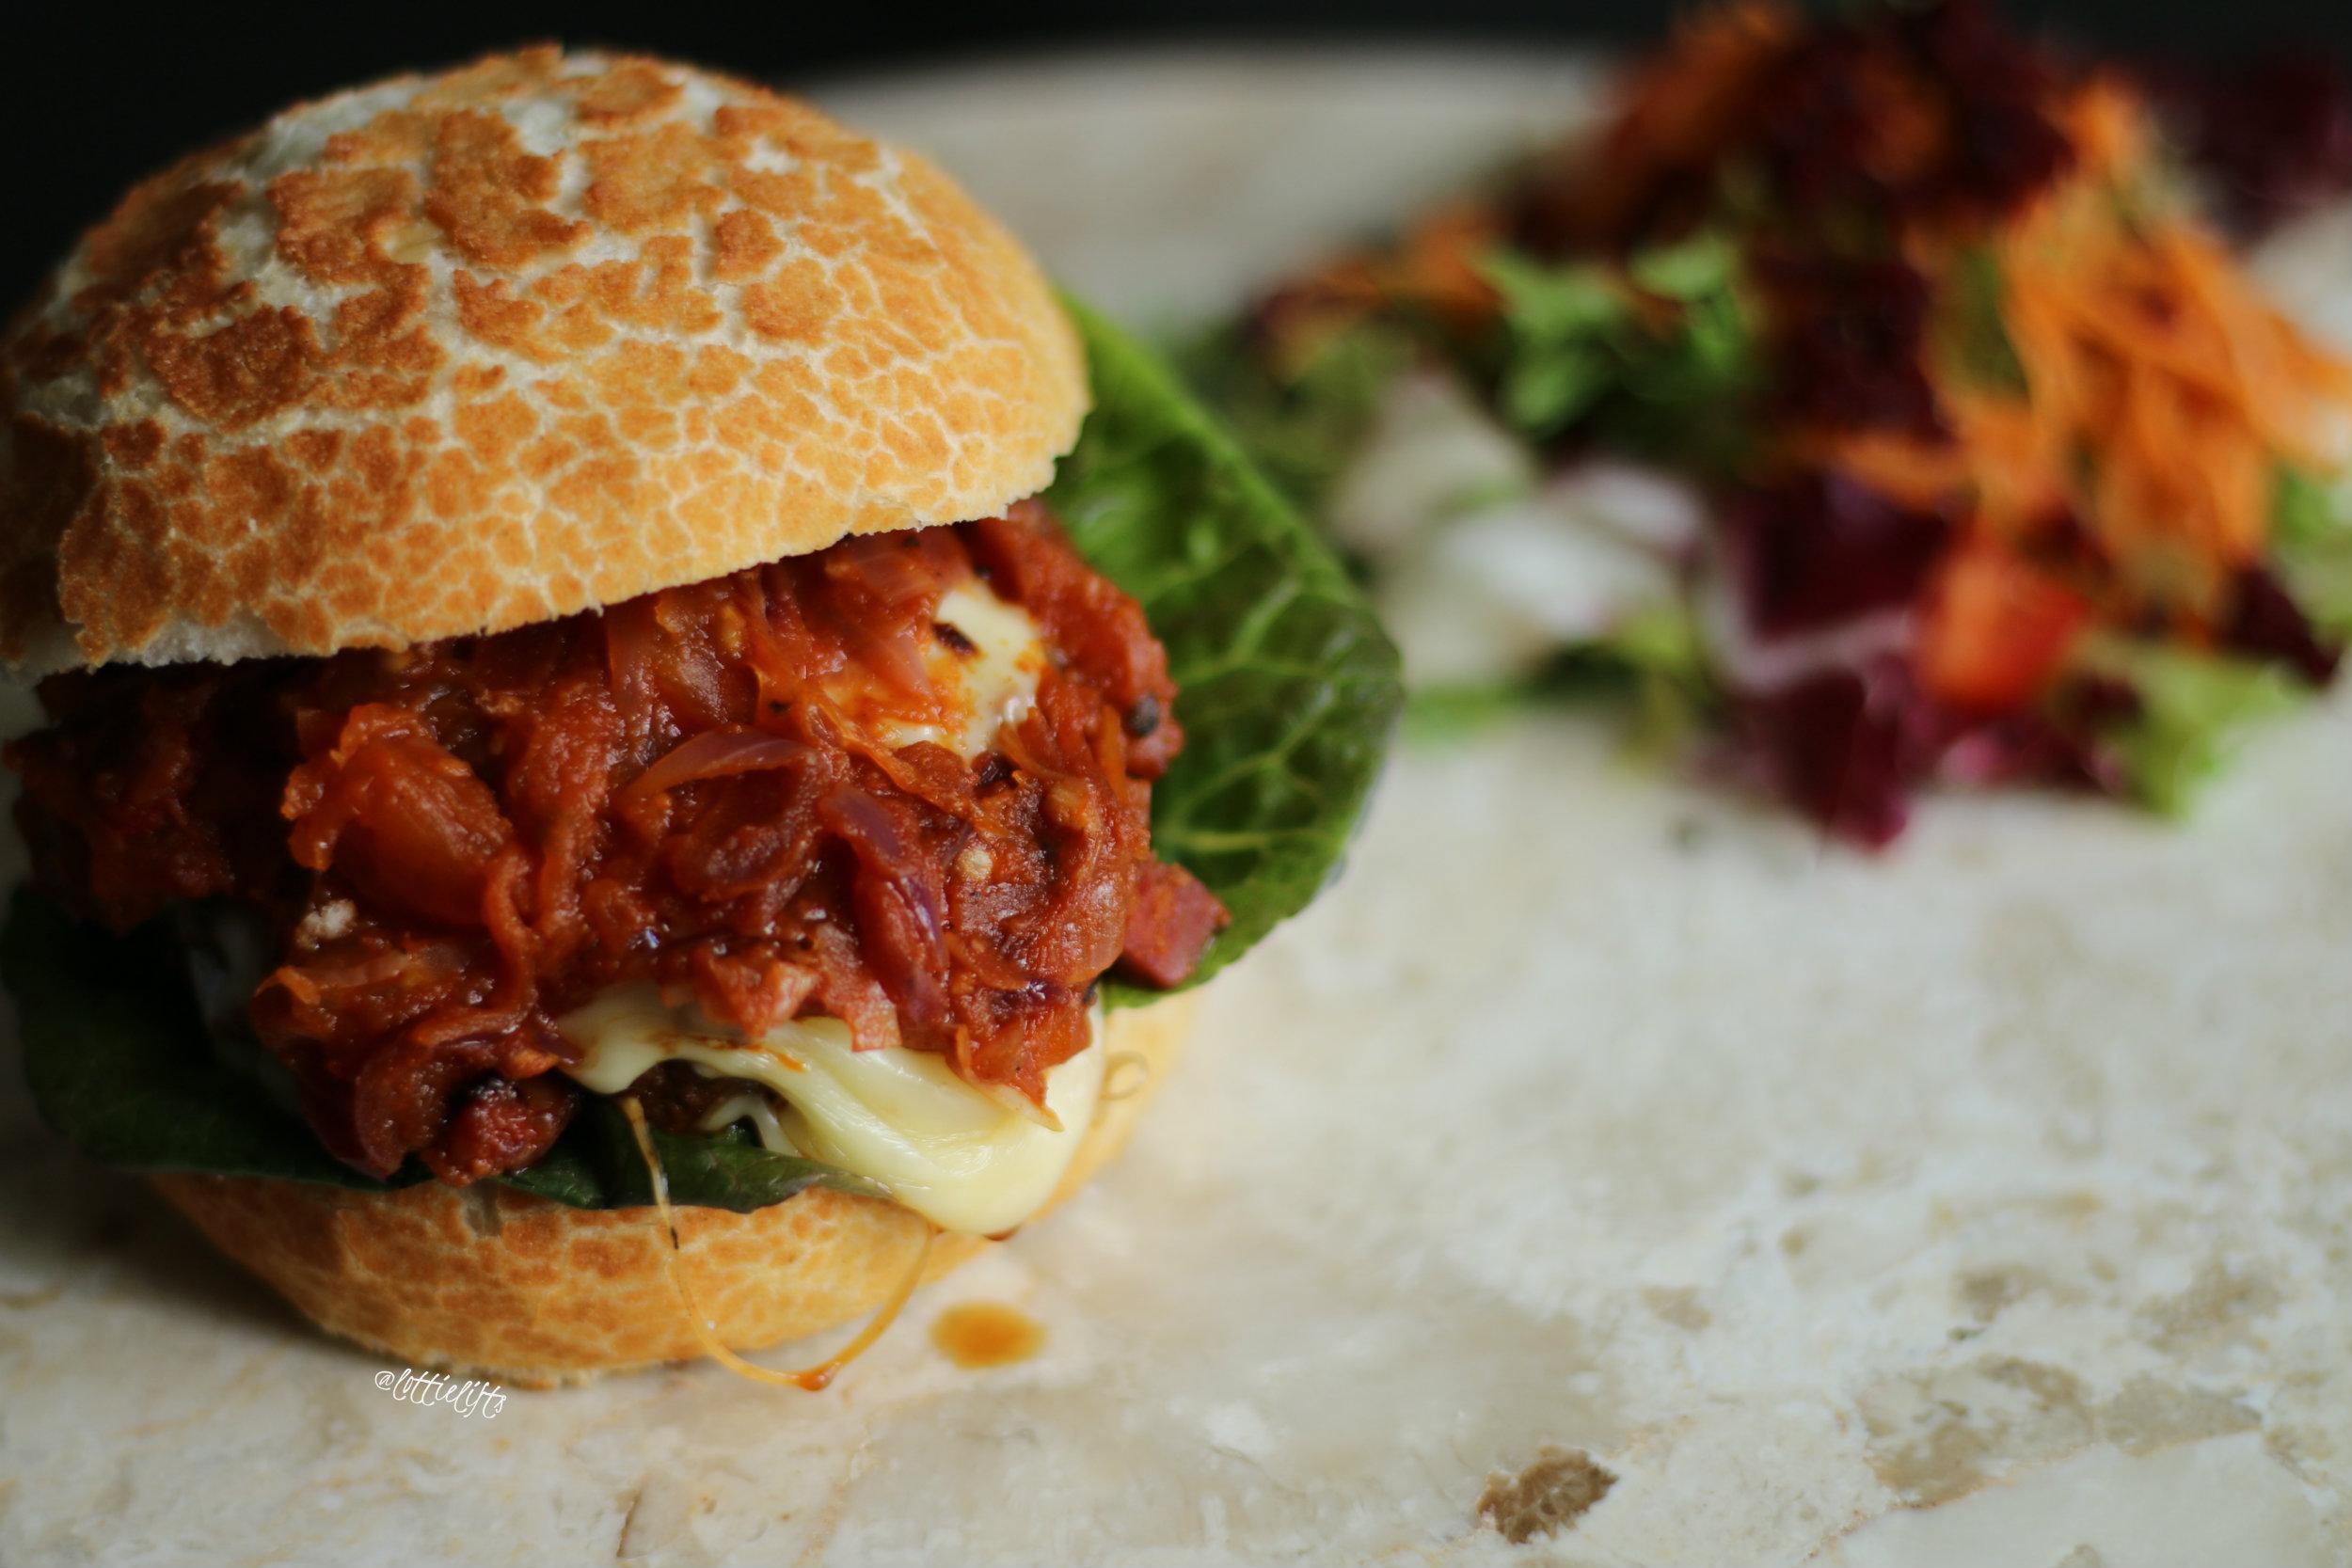 Chorizo Beef Burgers with Sweet & Smoky Tomato Relish